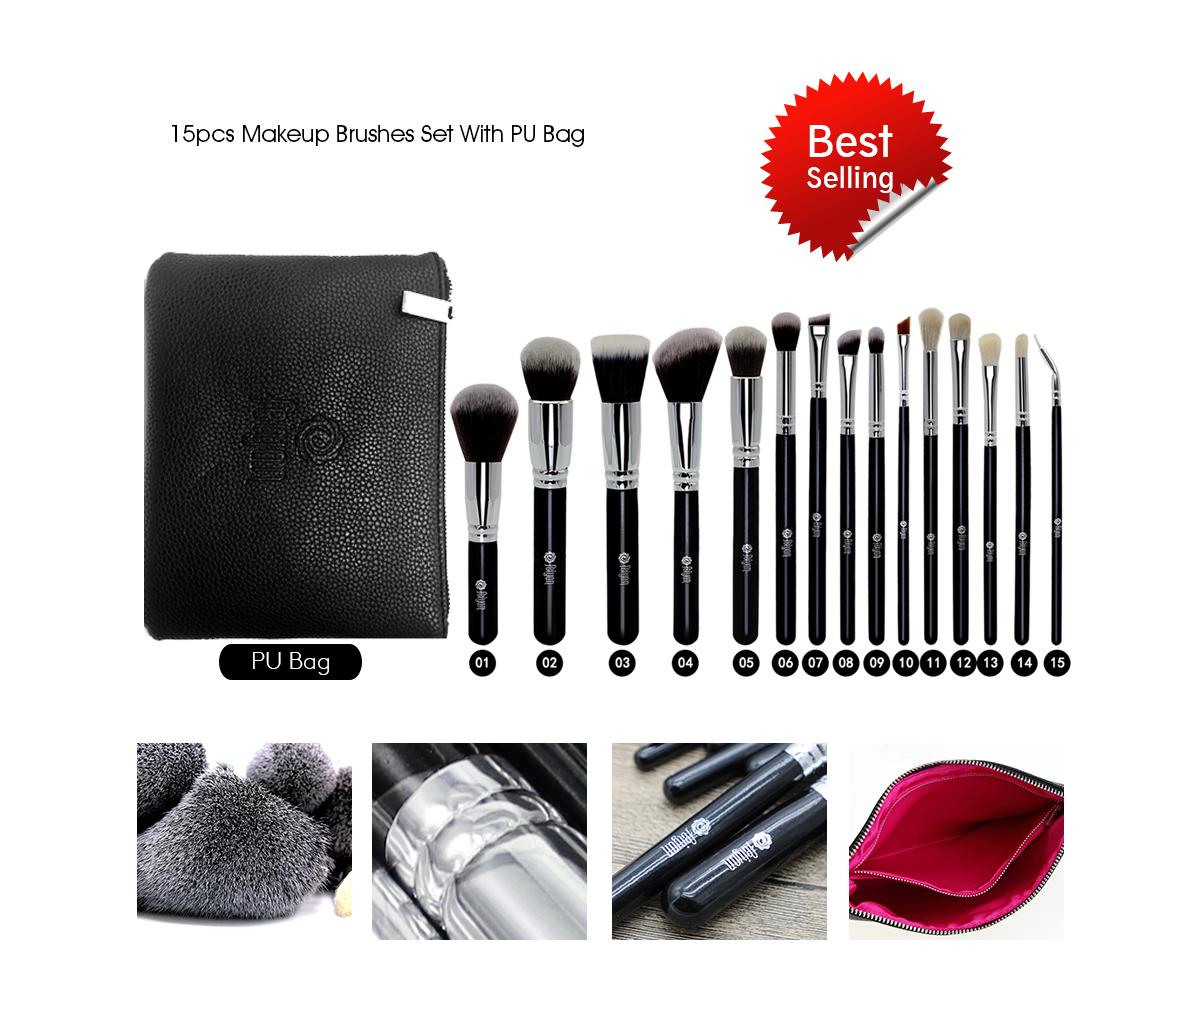 Kuas Kosmetik Make Up Brush Campuran Kontur Datar International Cylinder Case Sbs002bk 11 Polka Dot Black Set Highly Recommended